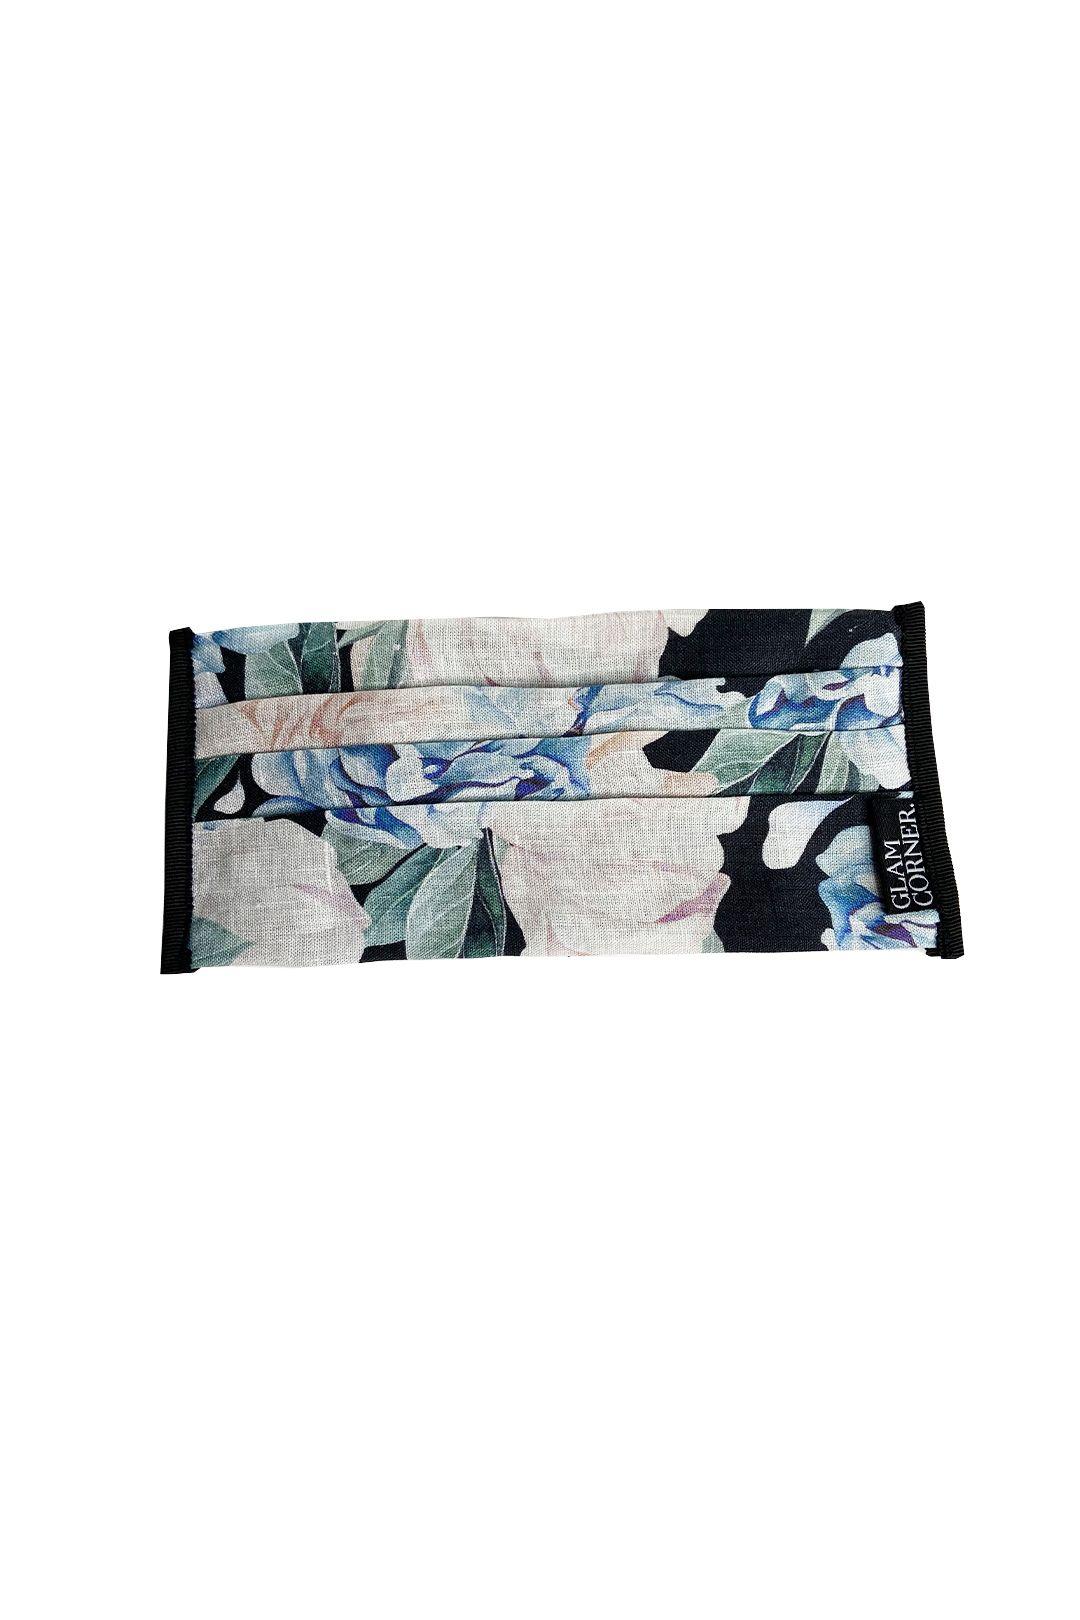 GlamCorner-Three-Layered-Fabric-Face-Masks-Fantasia-Floral-Front